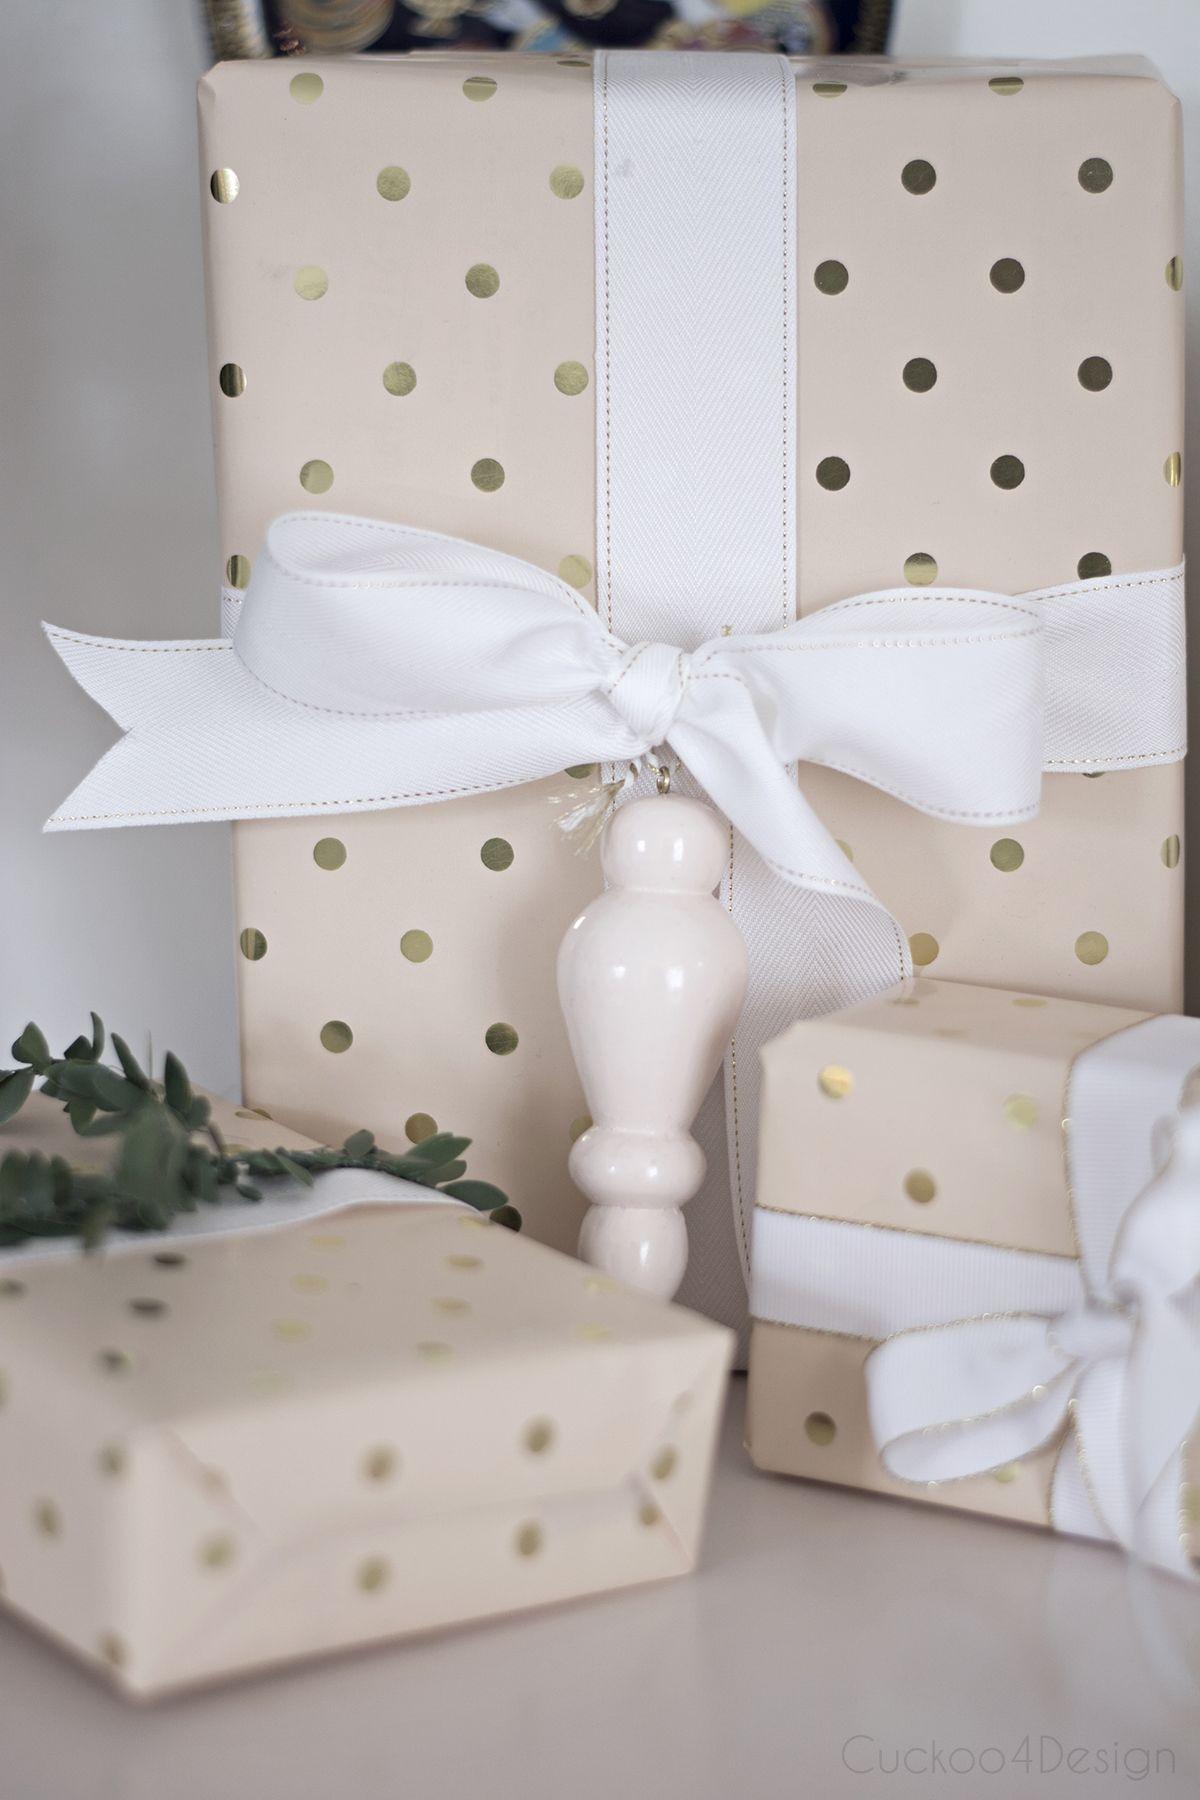 Better Homes and Gardens Christmas Ideas Home Tour | Pinterest ...